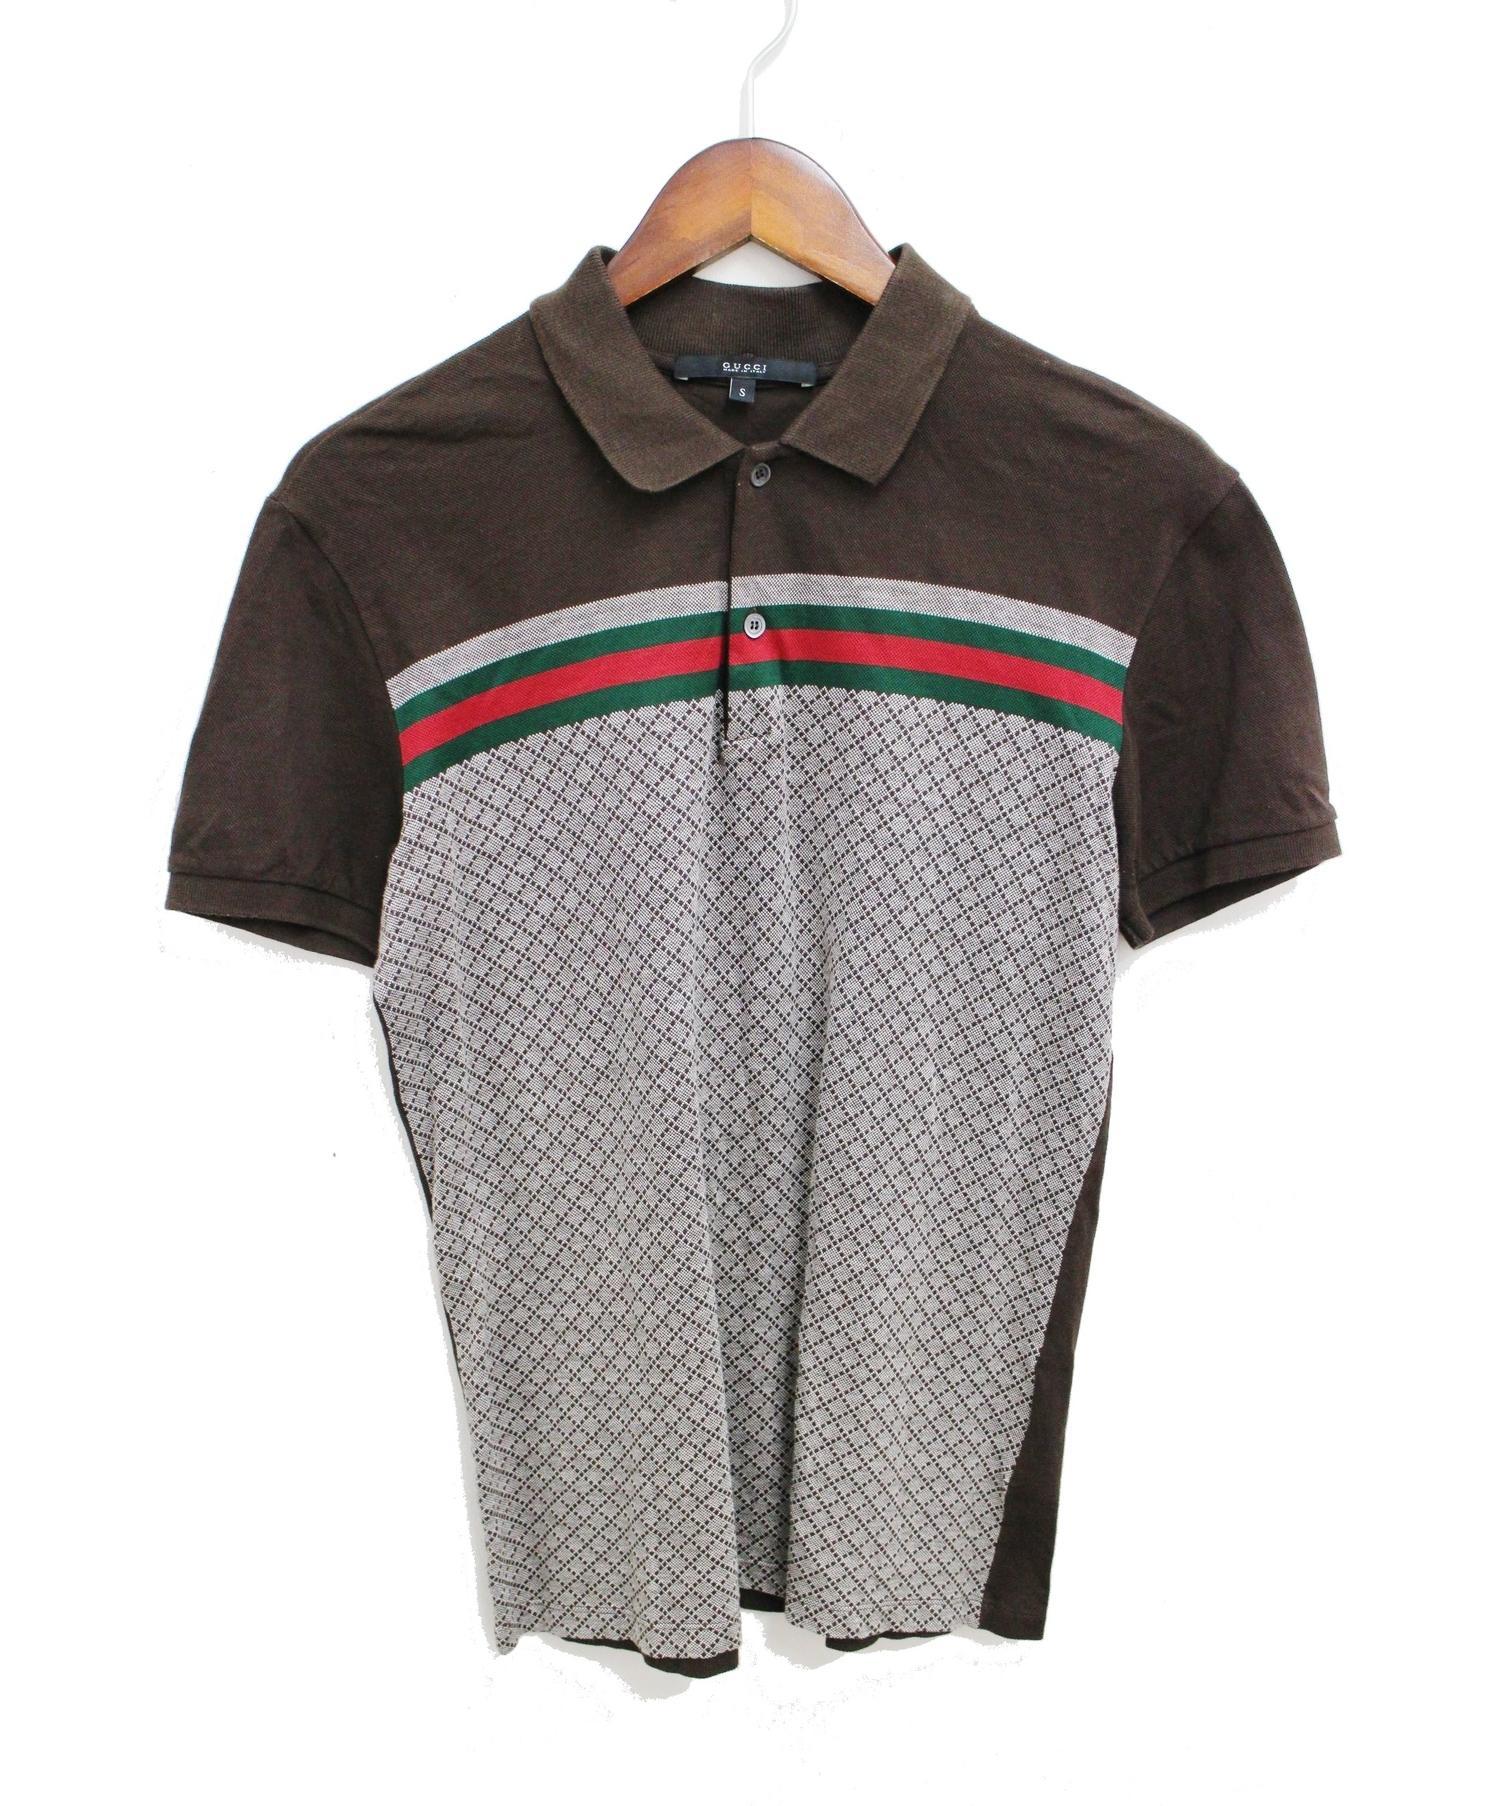 super popular 2efeb d52e8 [中古]GUCCI(グッチ)のメンズ シャツ(ブラウス) ポロシャツ